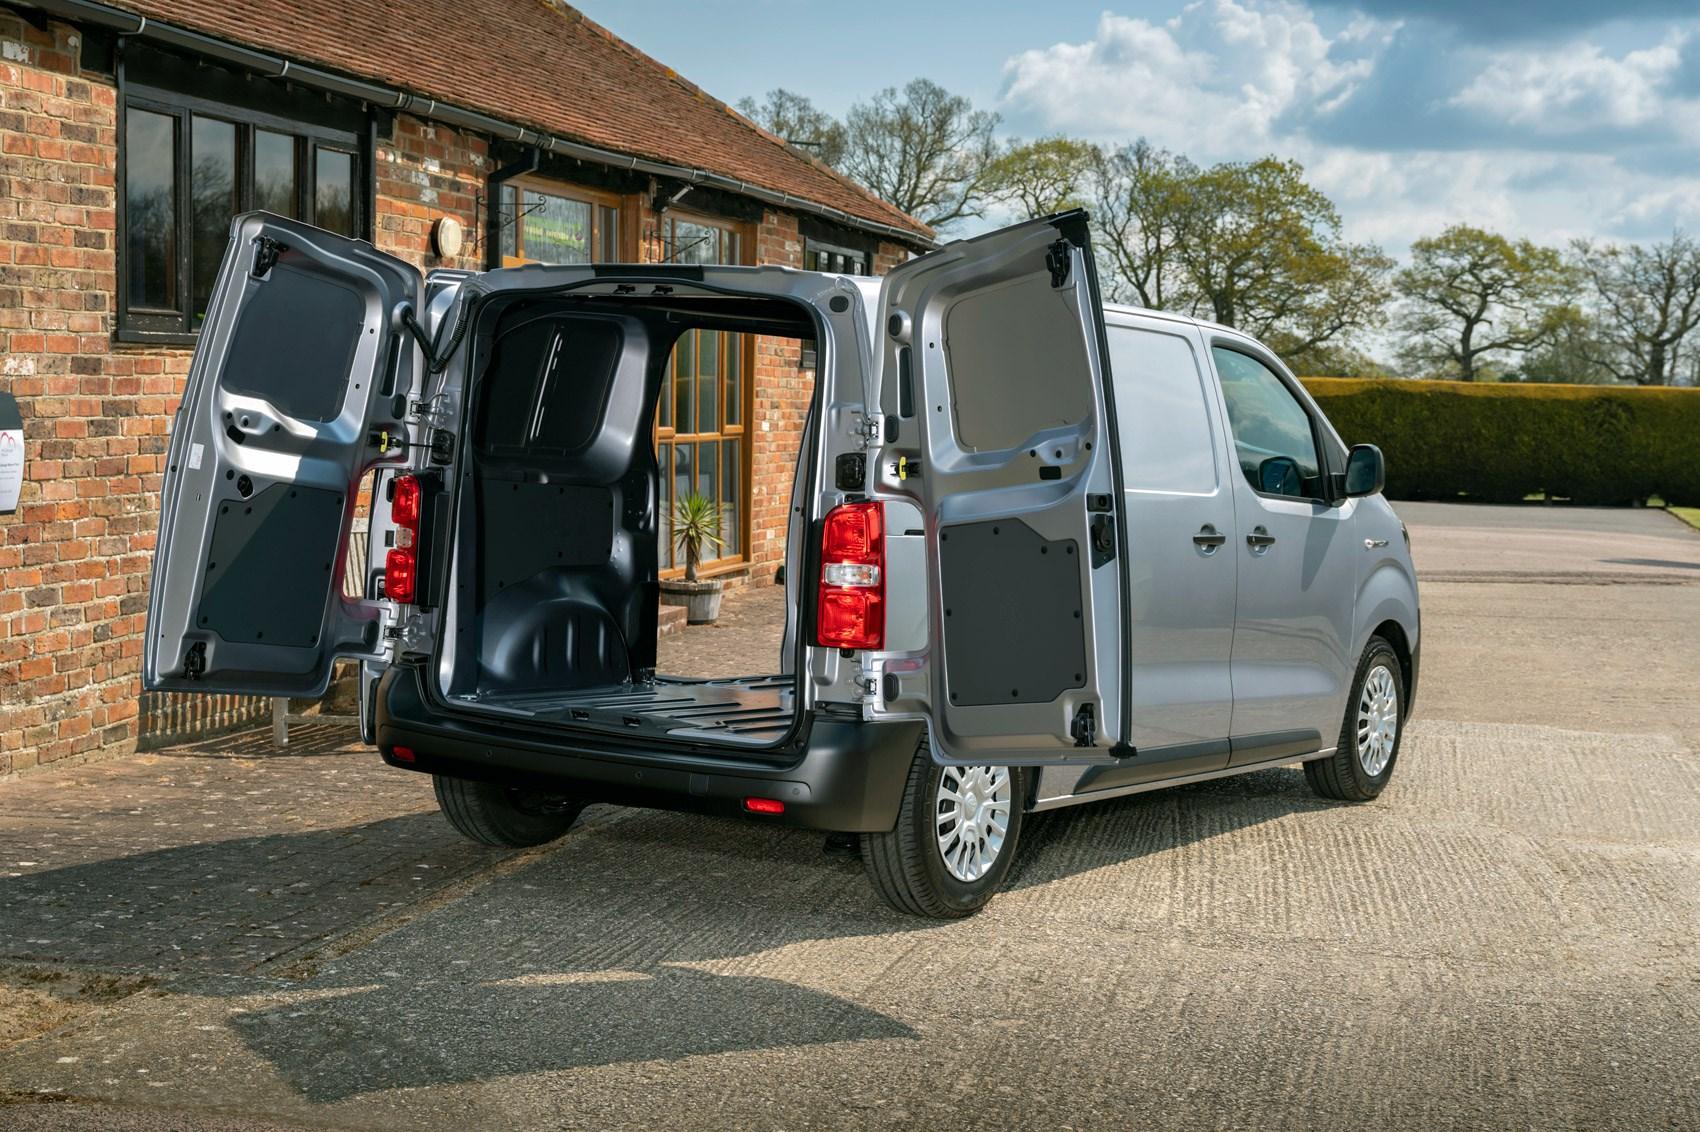 Toyota Proace Electric van review, rear view, loaded van with doors open